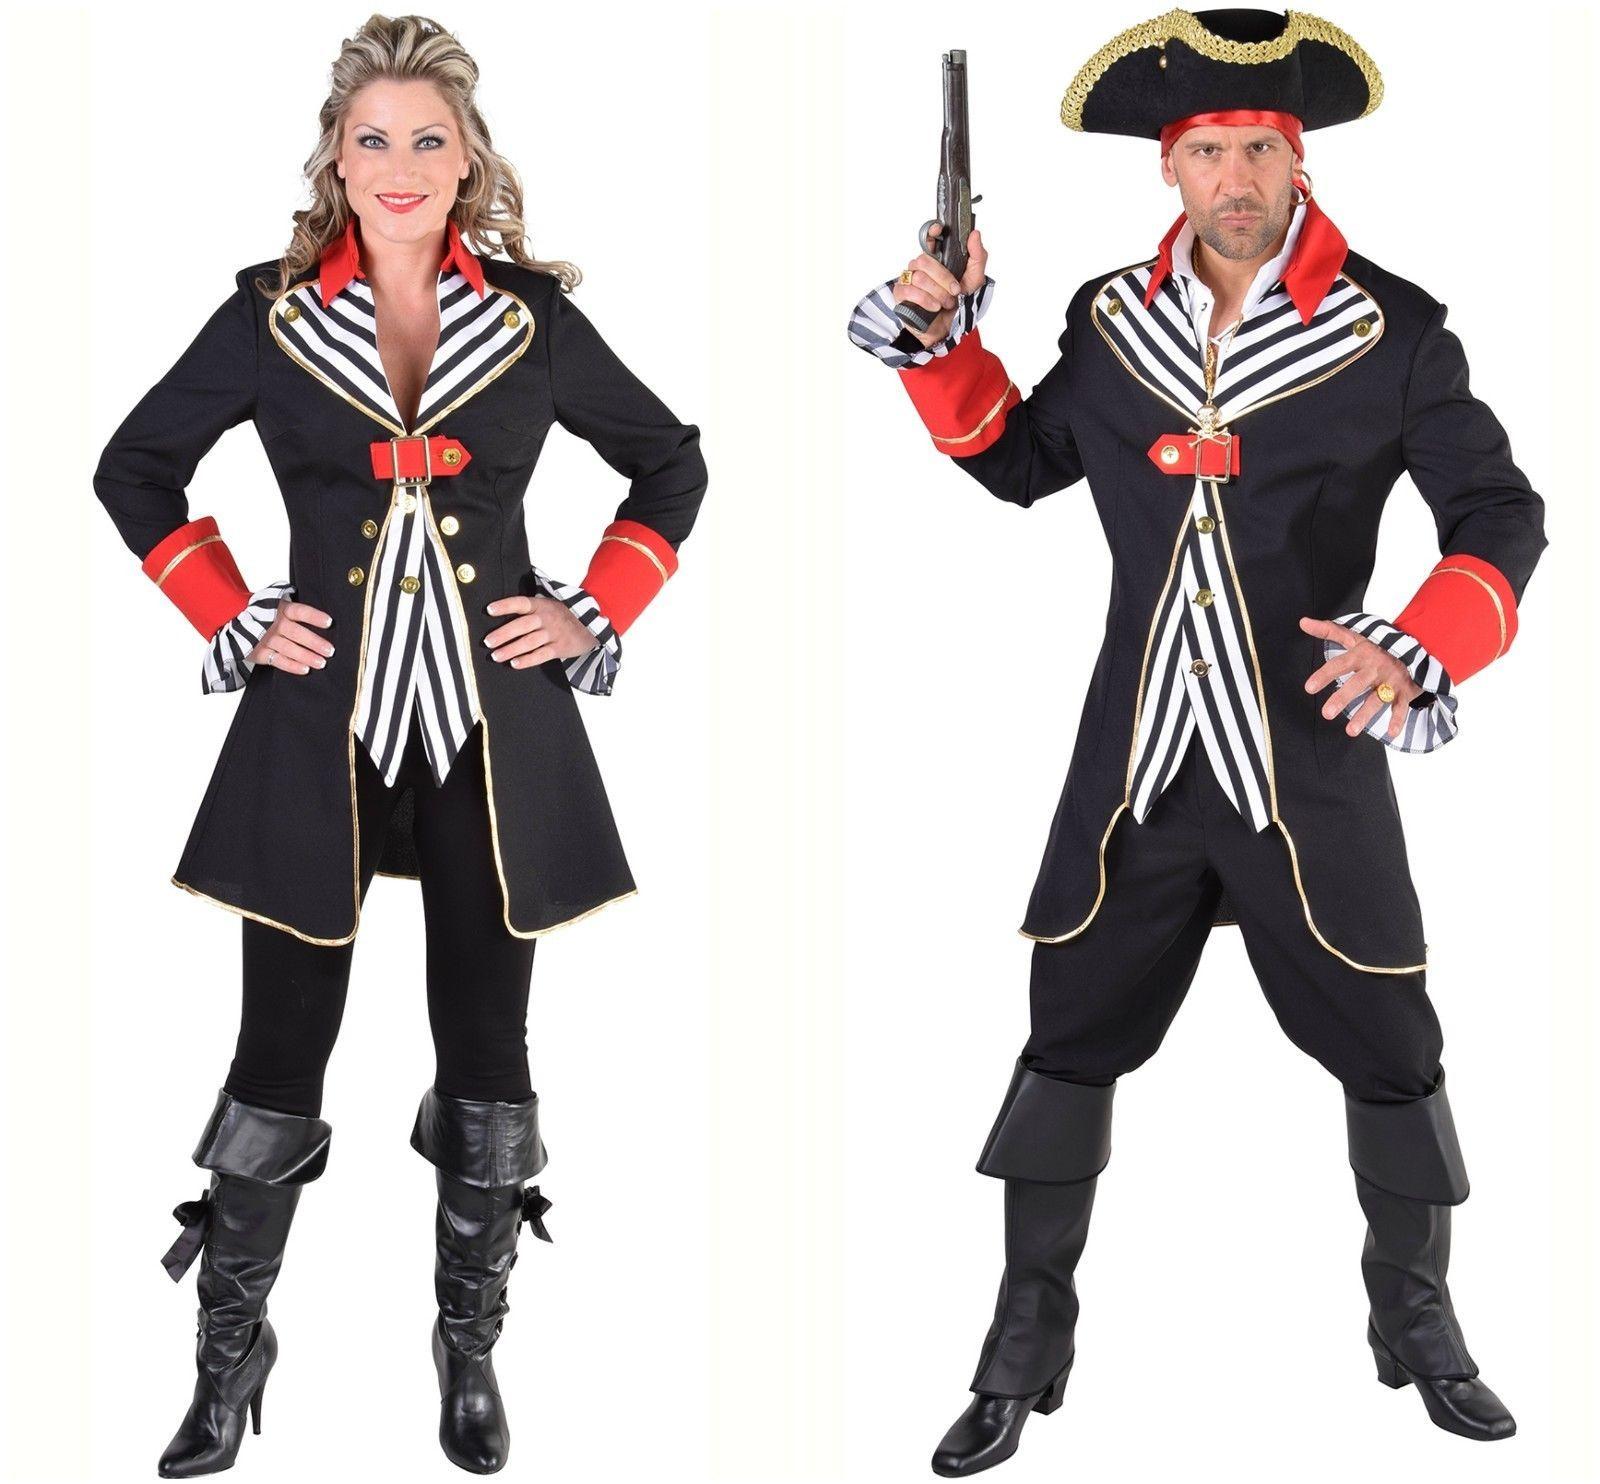 Gents Pirate Costume - Striped Waistcoat style - XS-XXL